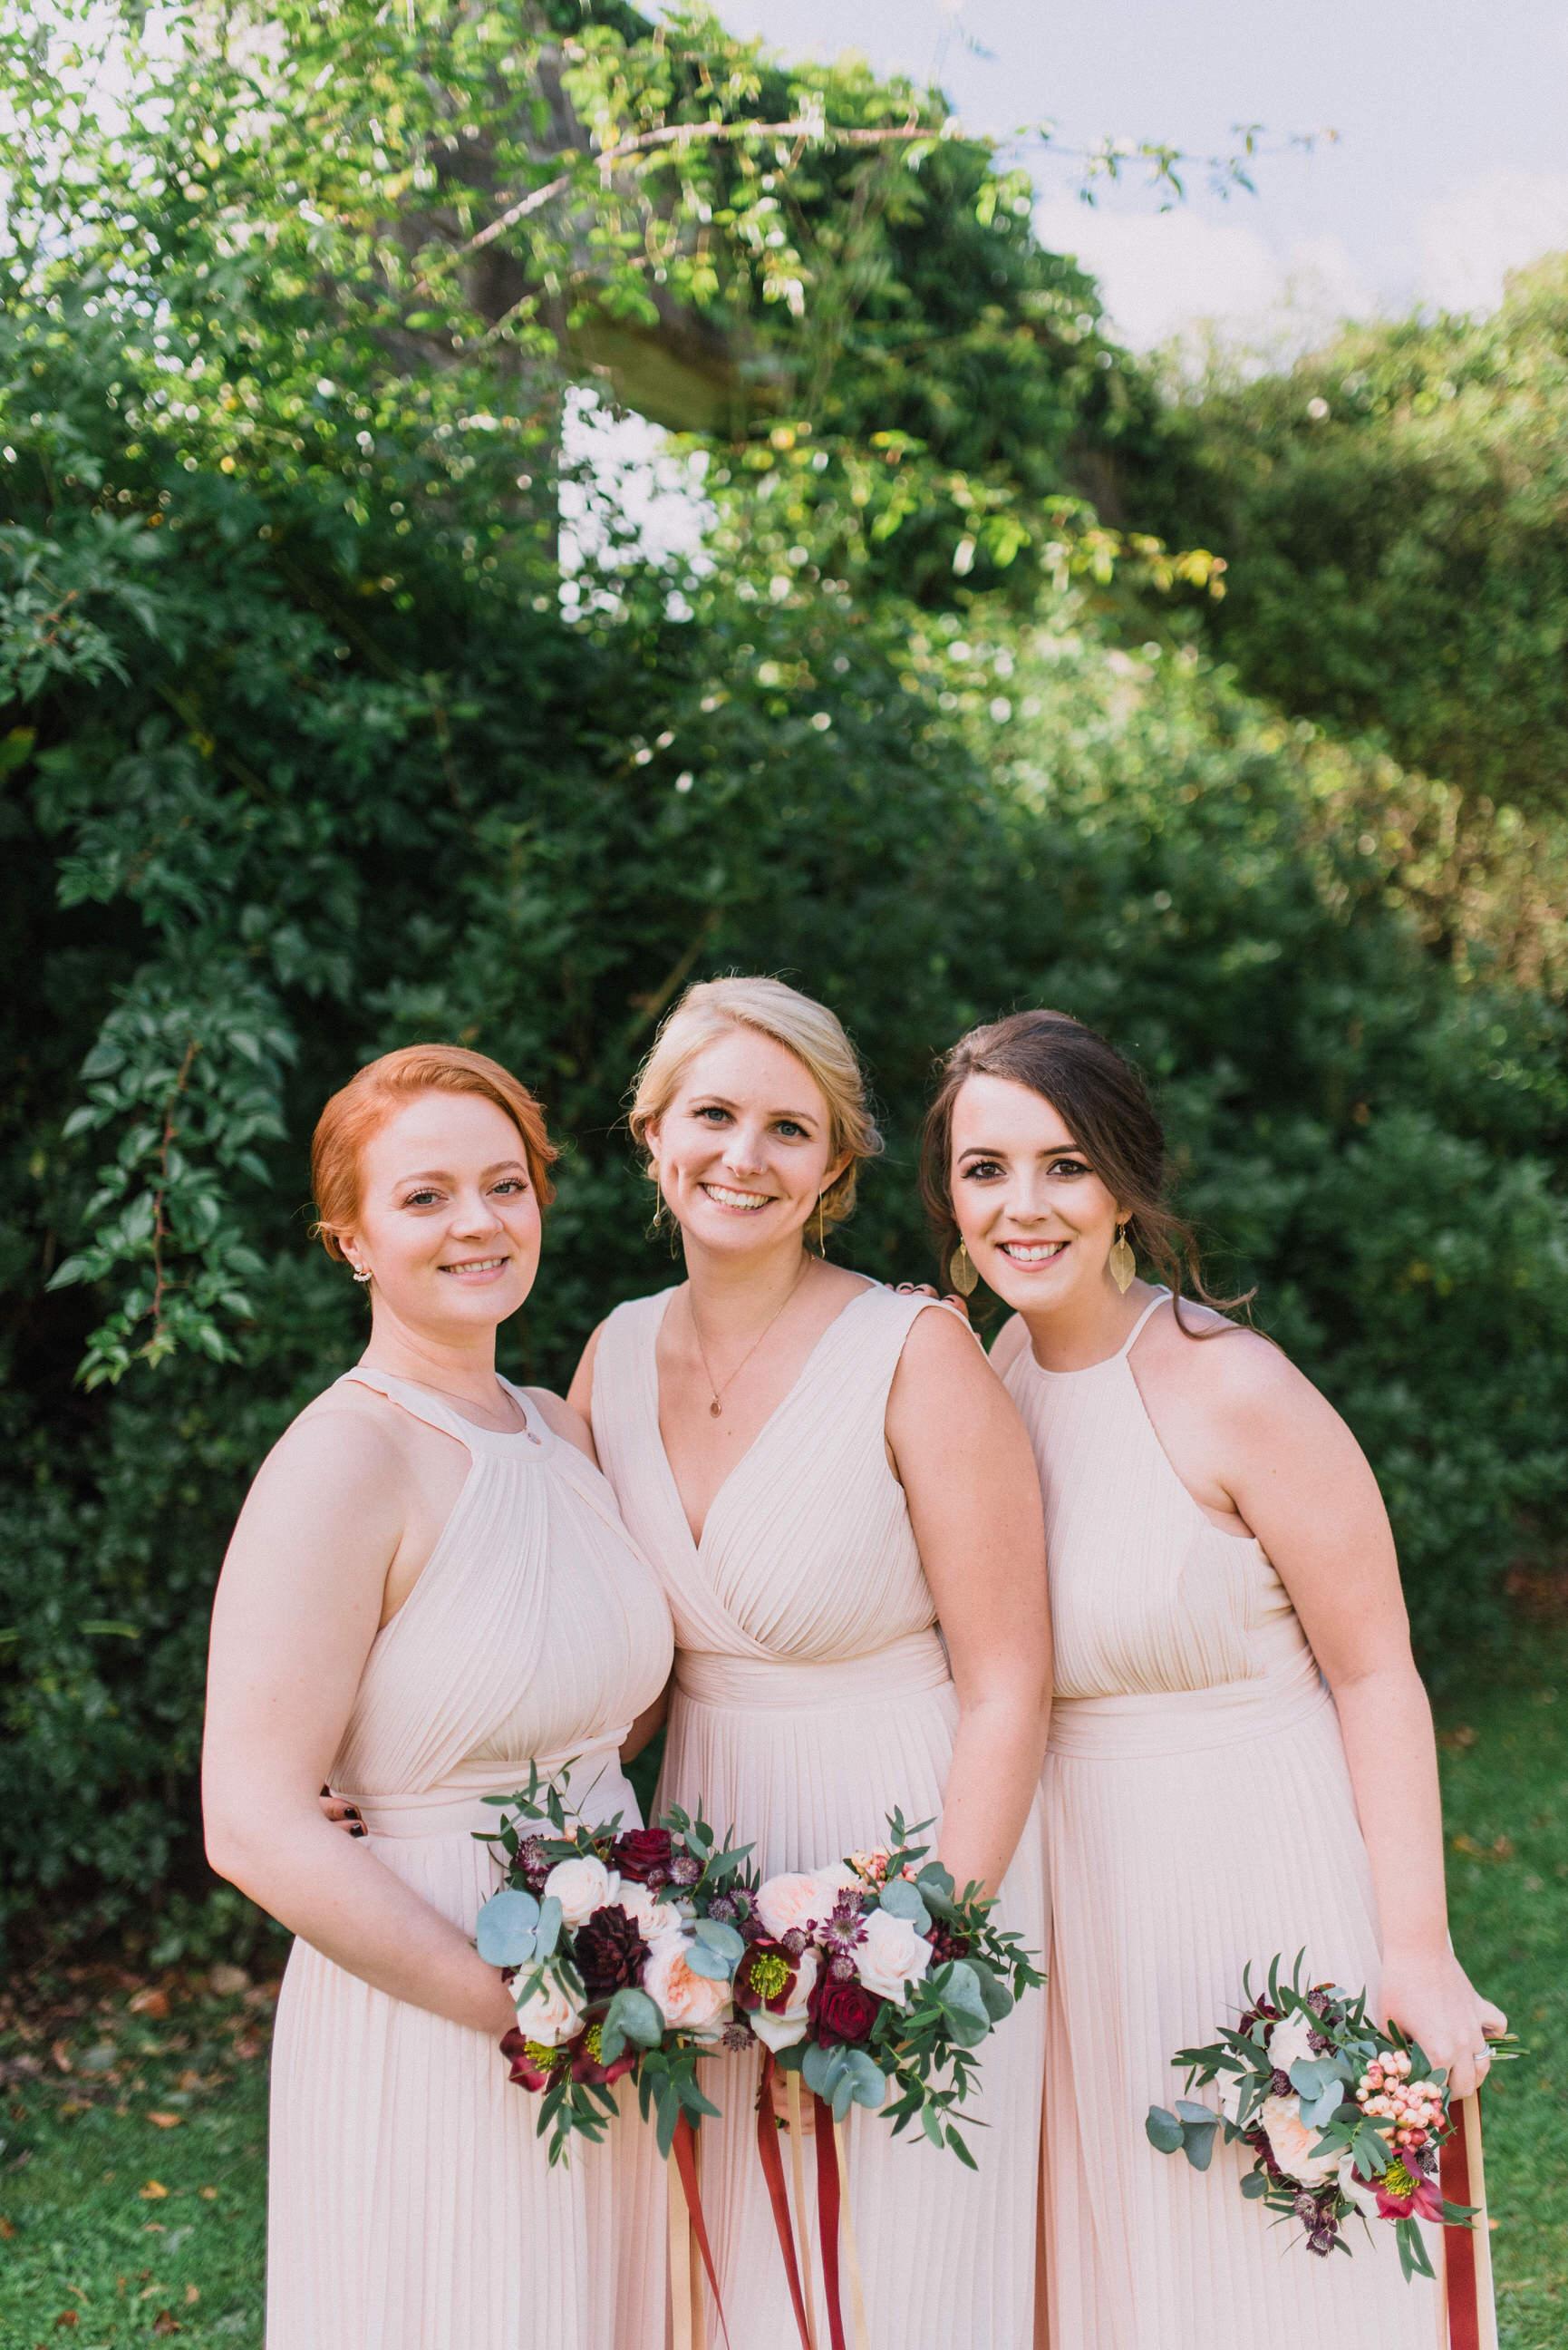 lissanoure castle wedding, northern ireland wedding photographer, romantic northern irish wedding venue, castle wedding ireland, natural wedding photography ni (81).jpg